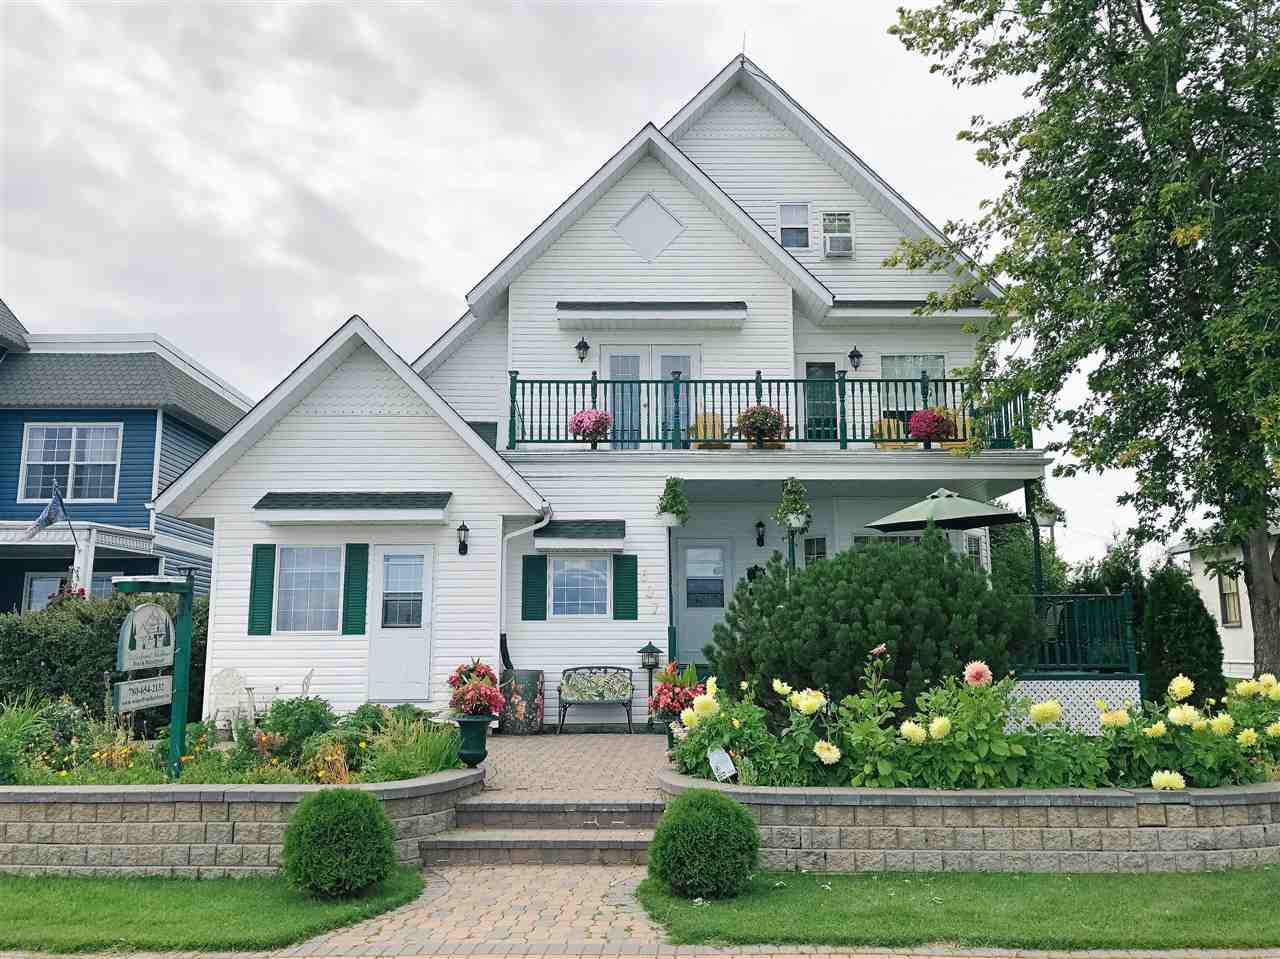 Main Photo: 607 Lakeshore Drive: Cold Lake House for sale : MLS®# E4170655